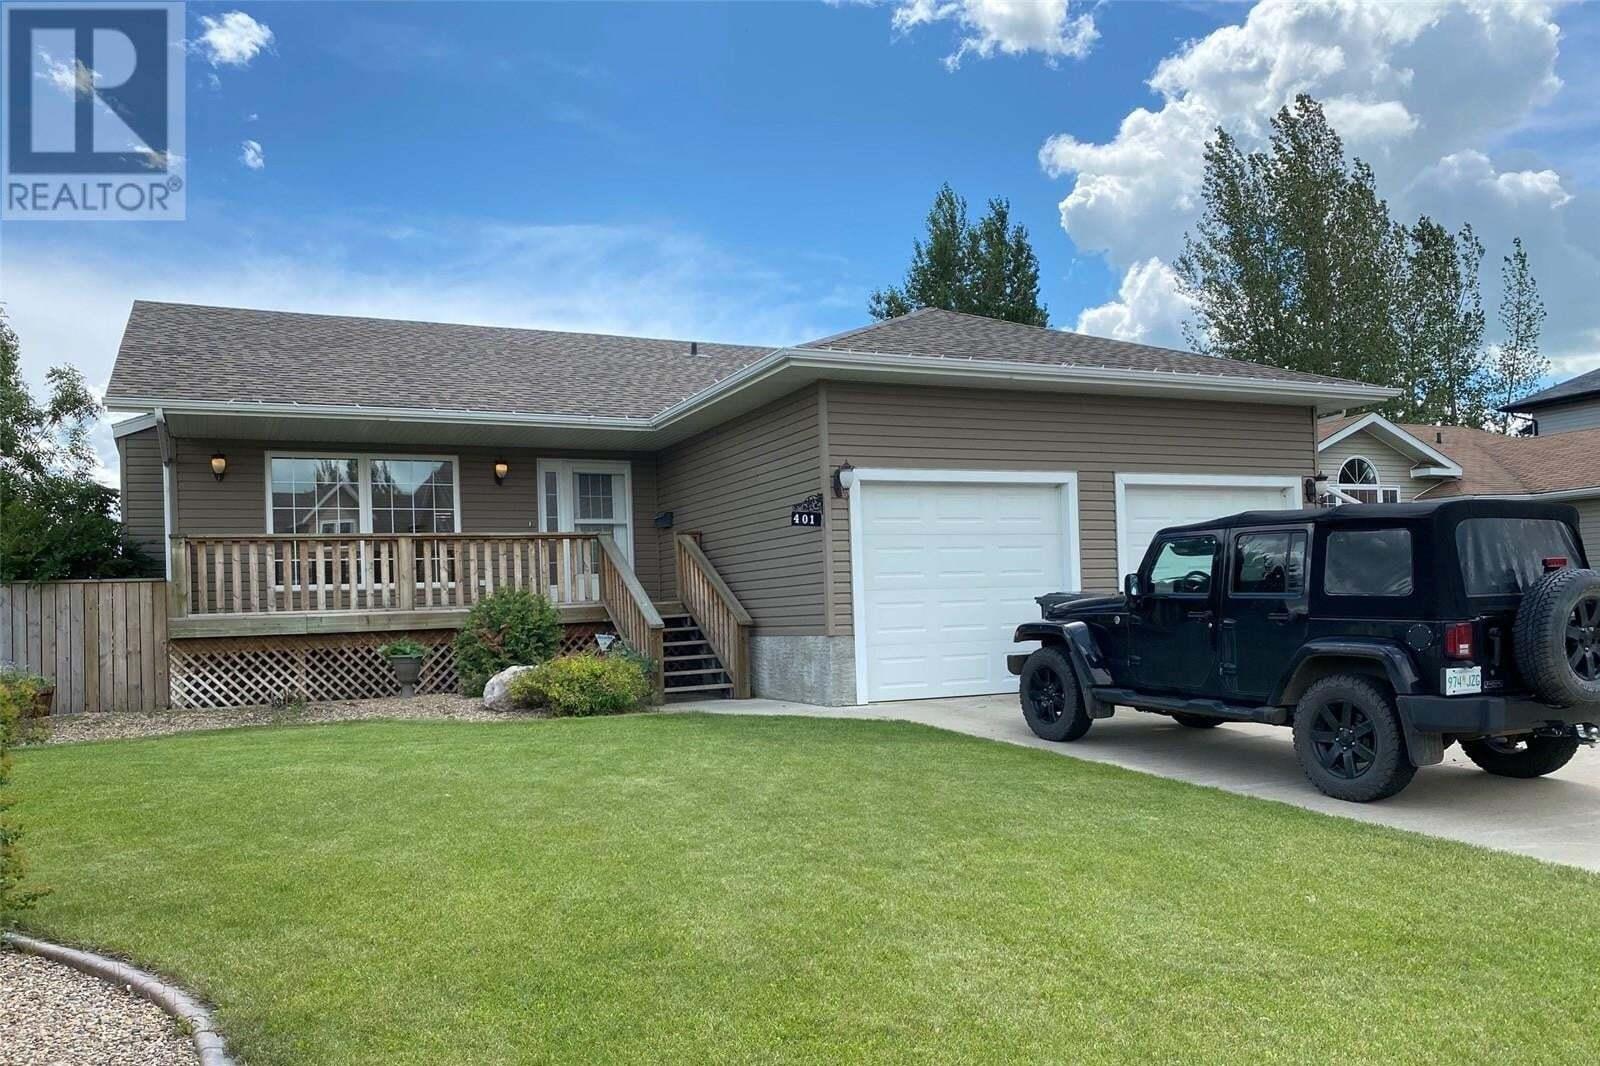 House for sale at 401 38th St Battleford Saskatchewan - MLS: SK818473